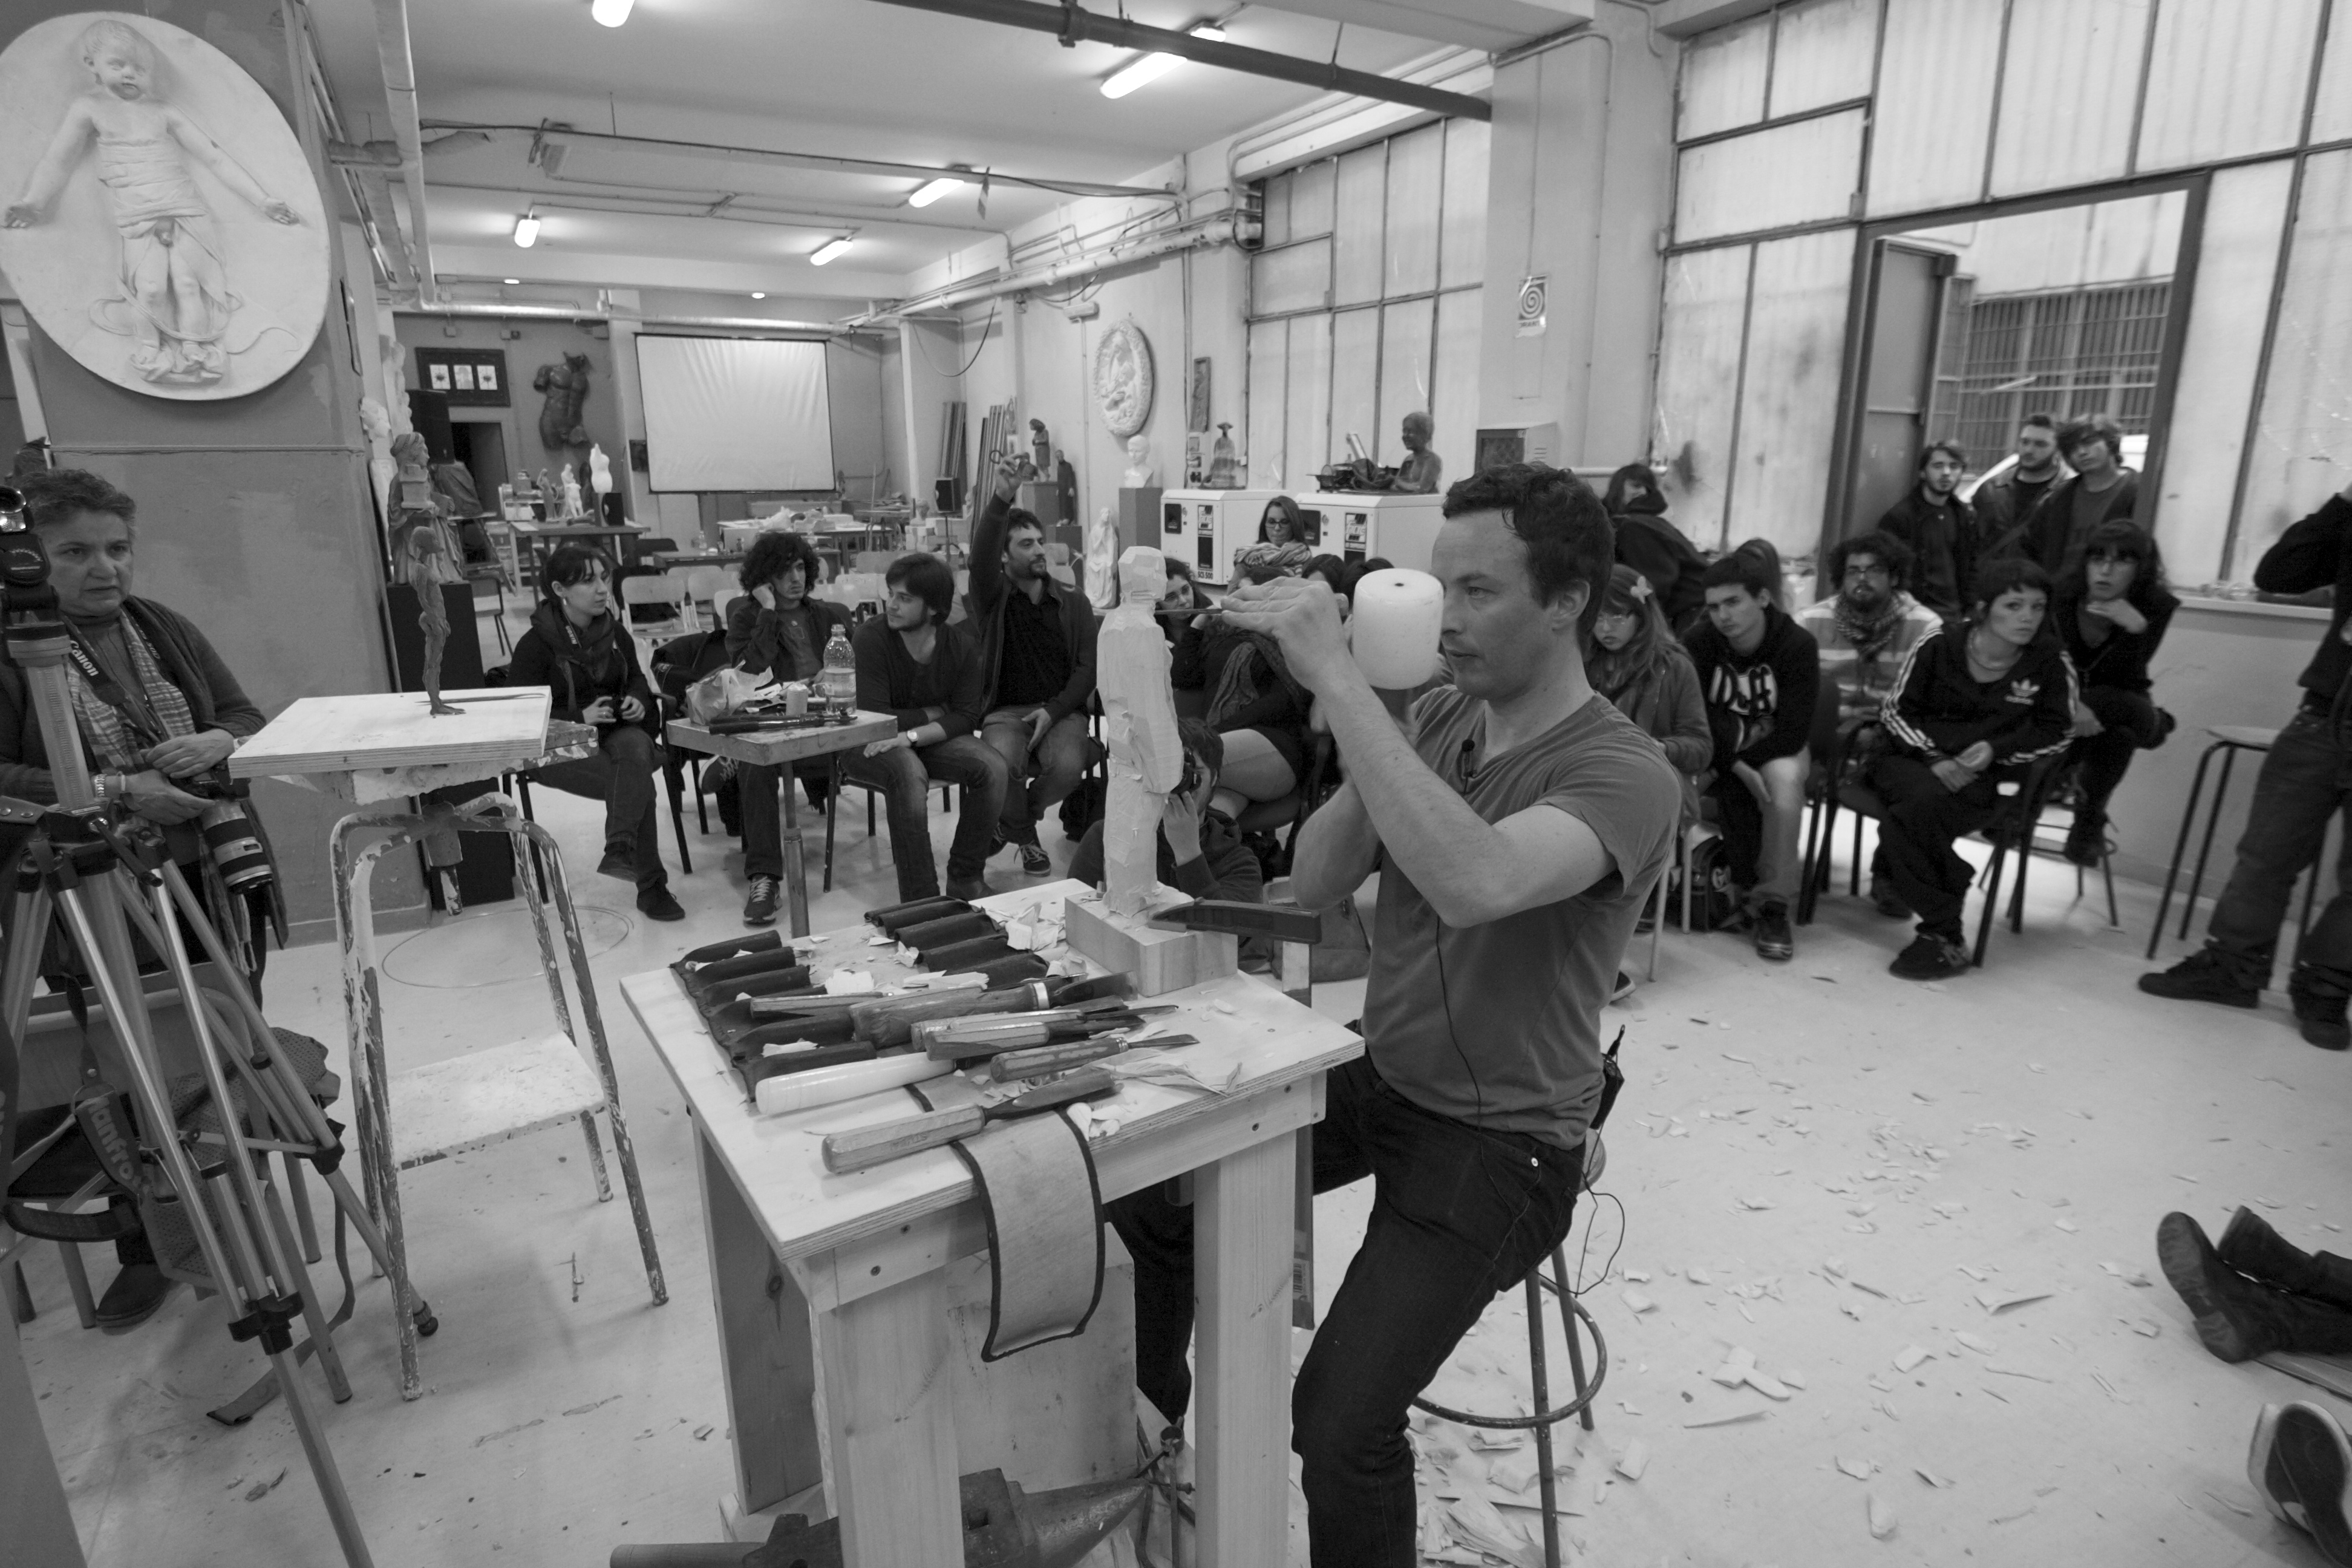 Flickr - Aron Demetz - Dialoghi e materia - Workshop a cura di Franco Reina87